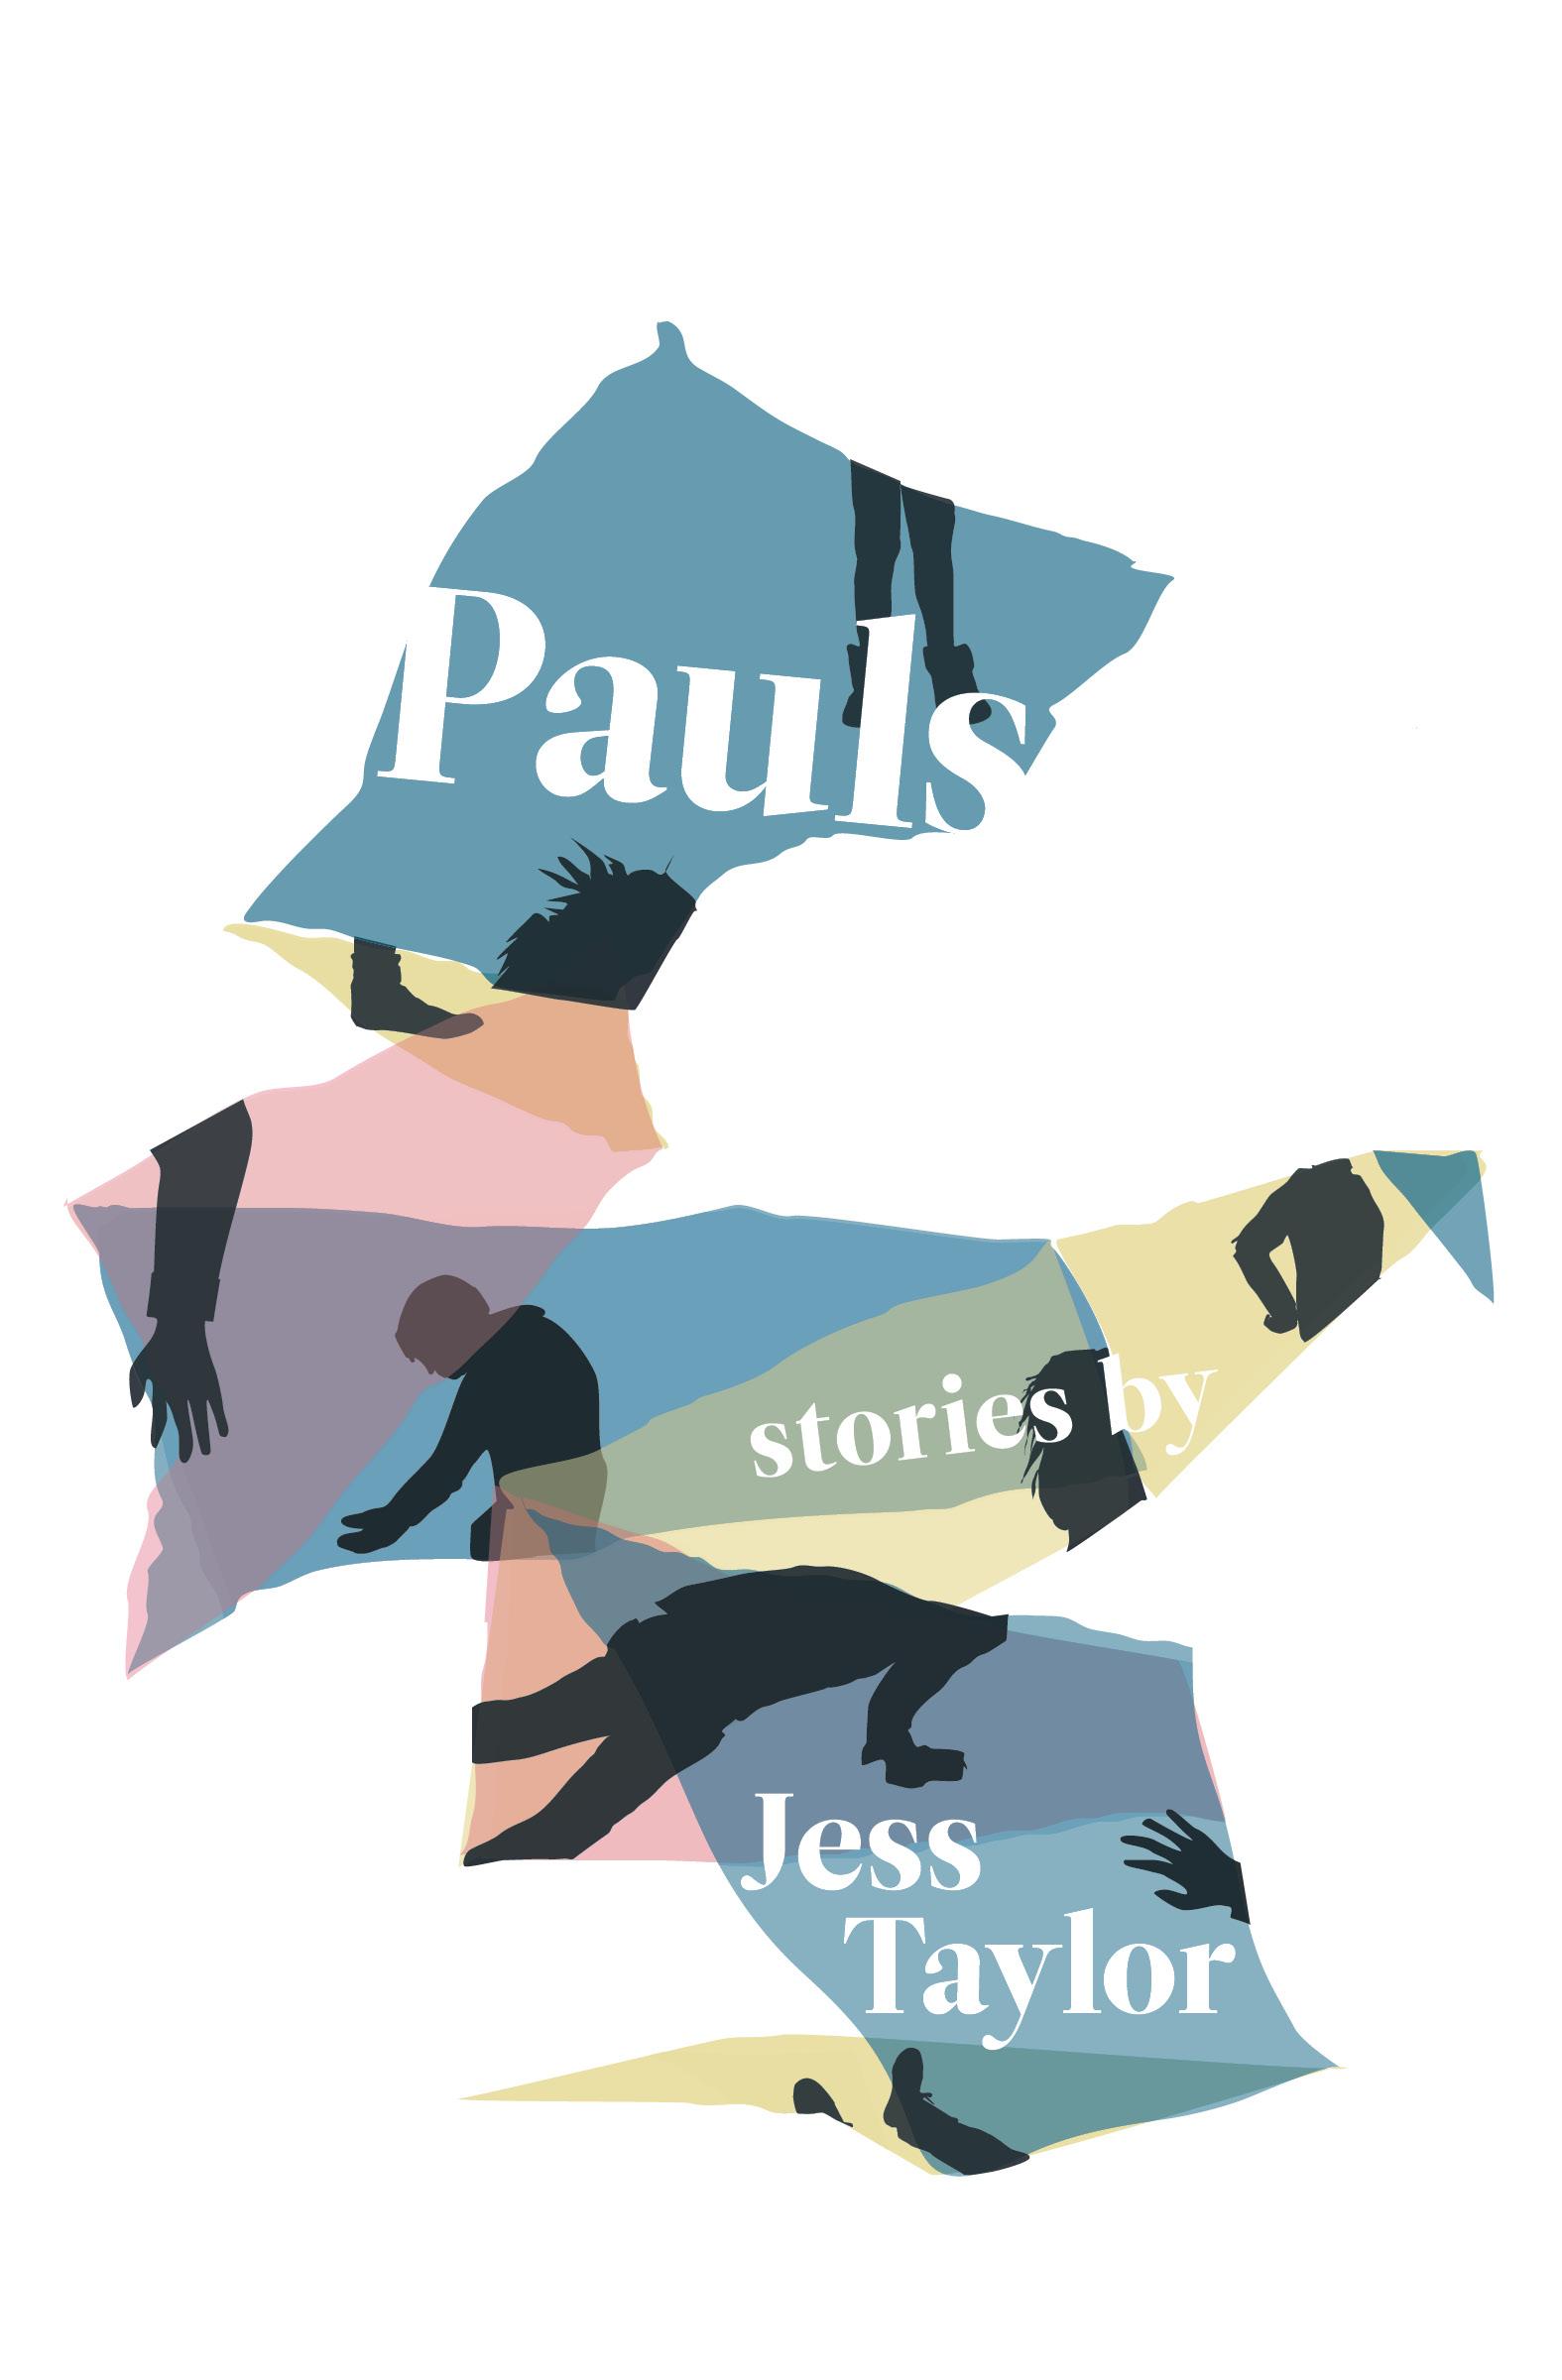 Pauls front cover final 300dpi.jpg